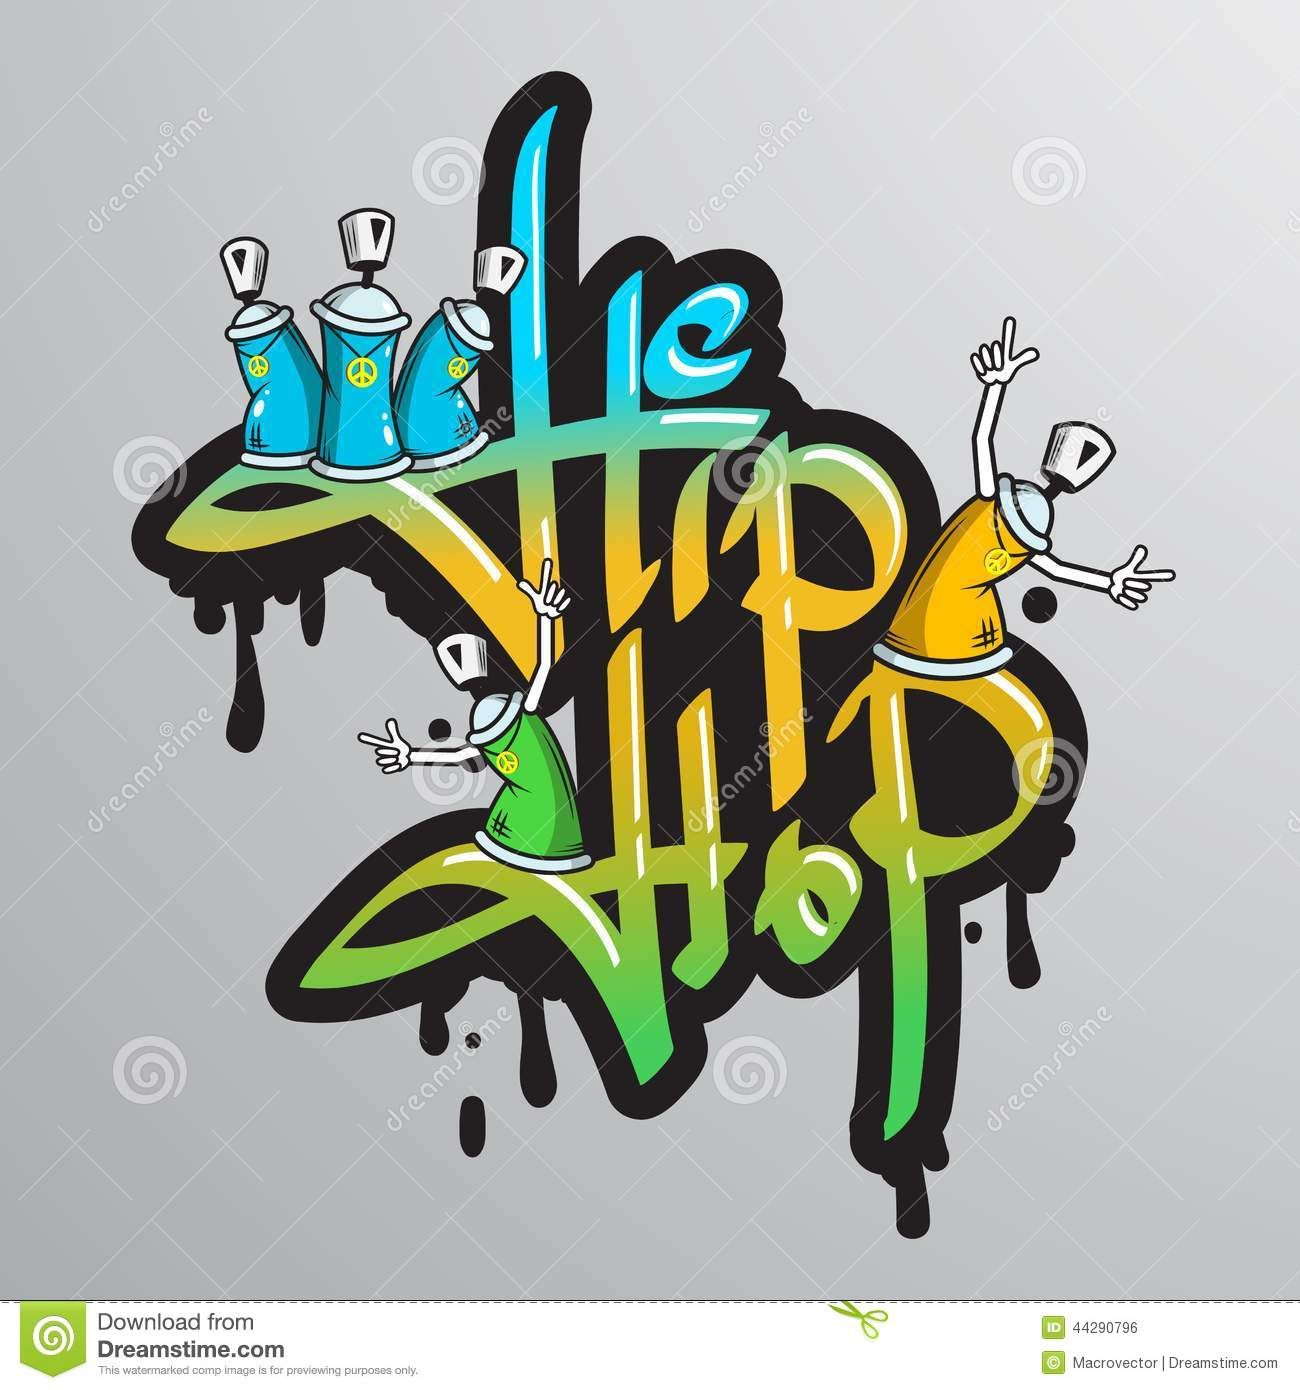 Vector Graffiti Google Search Youth Logo Ideas Pinterest Search And Graffiti